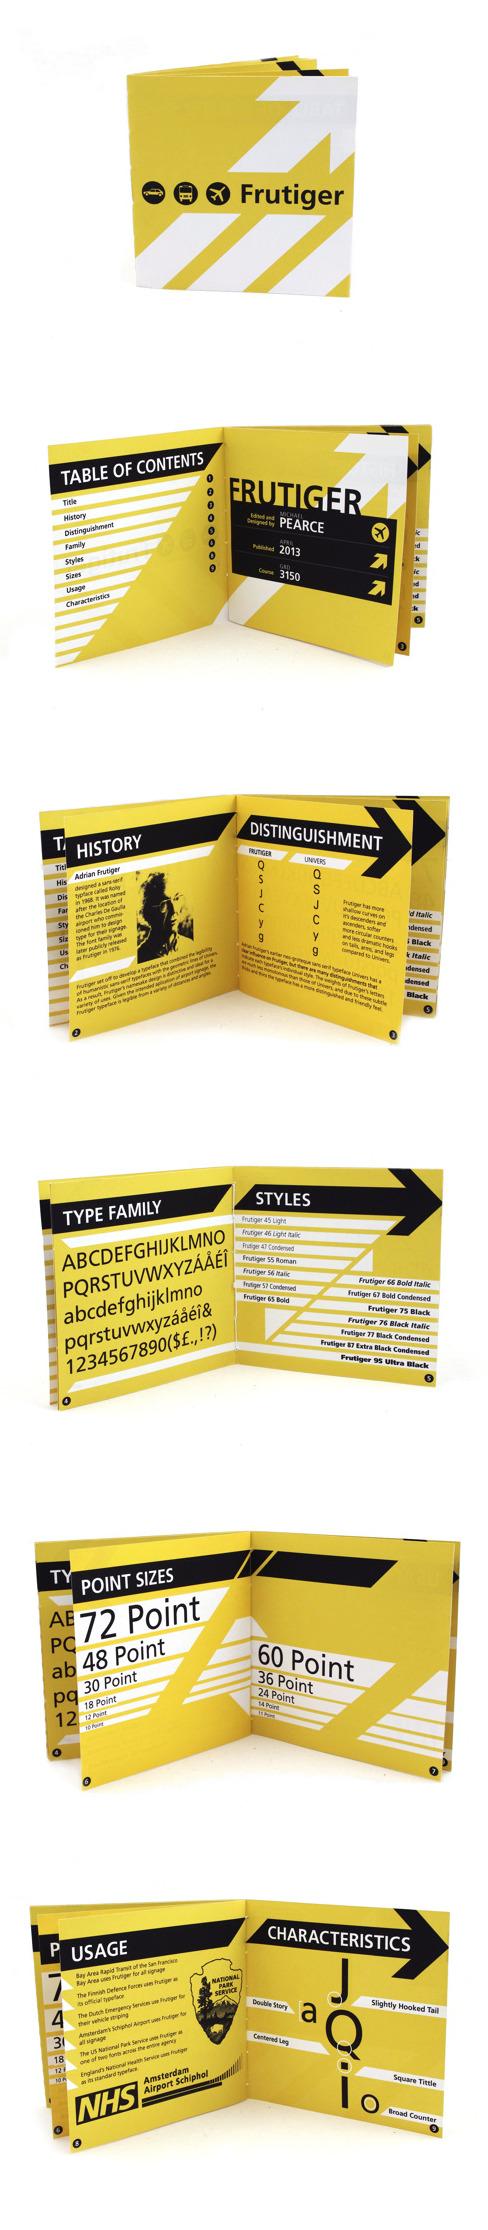 Frutiger Type Specimen Booklet By Michael Pearce